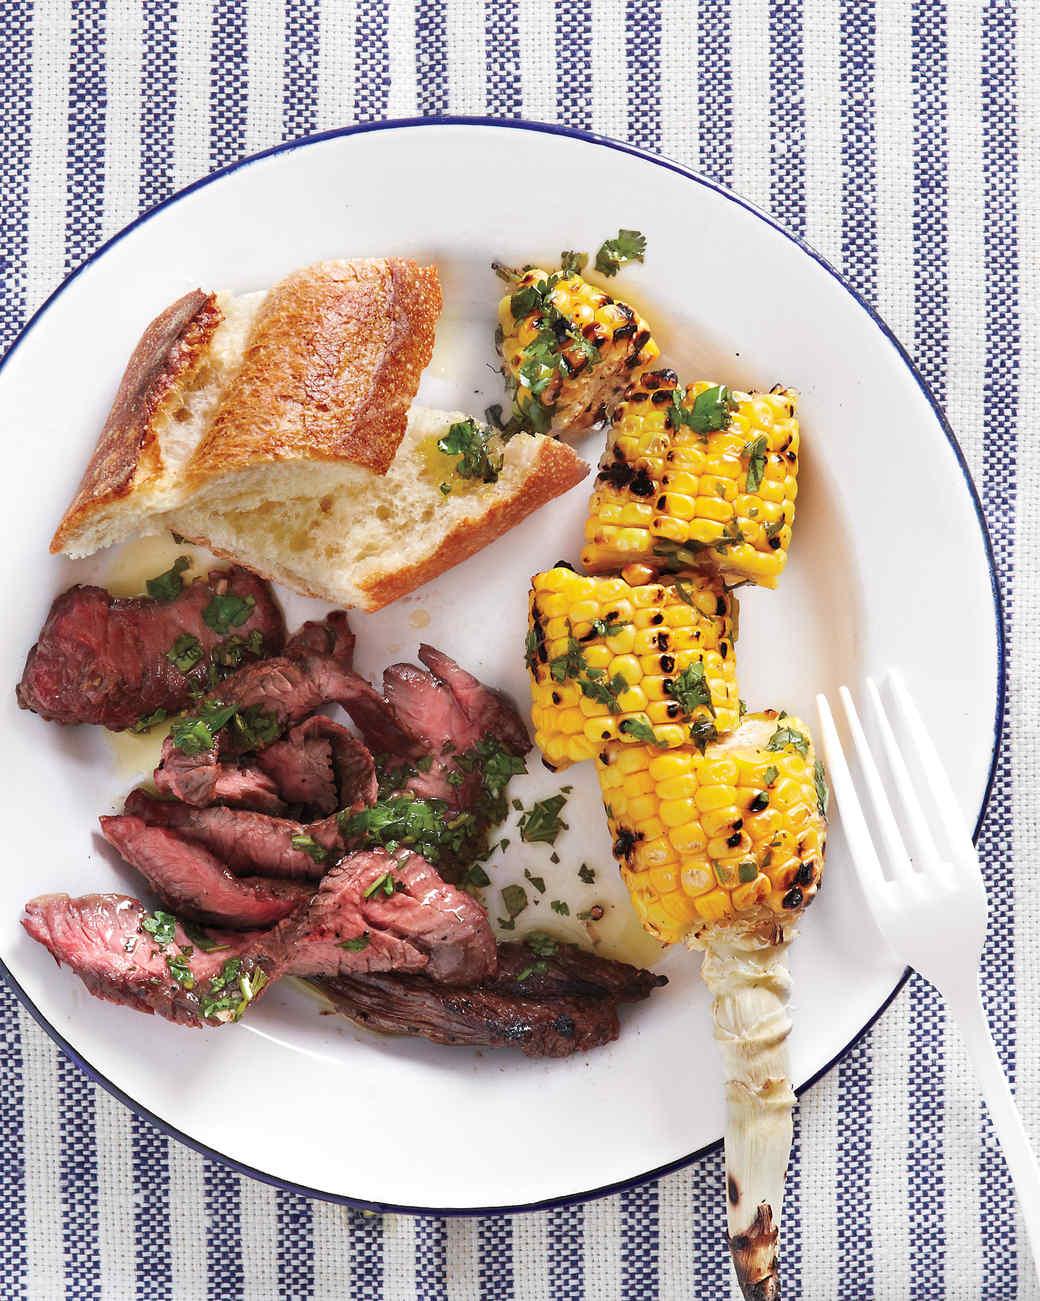 grilled-skirt-steak-corn-plated-0390-d111118.jpg